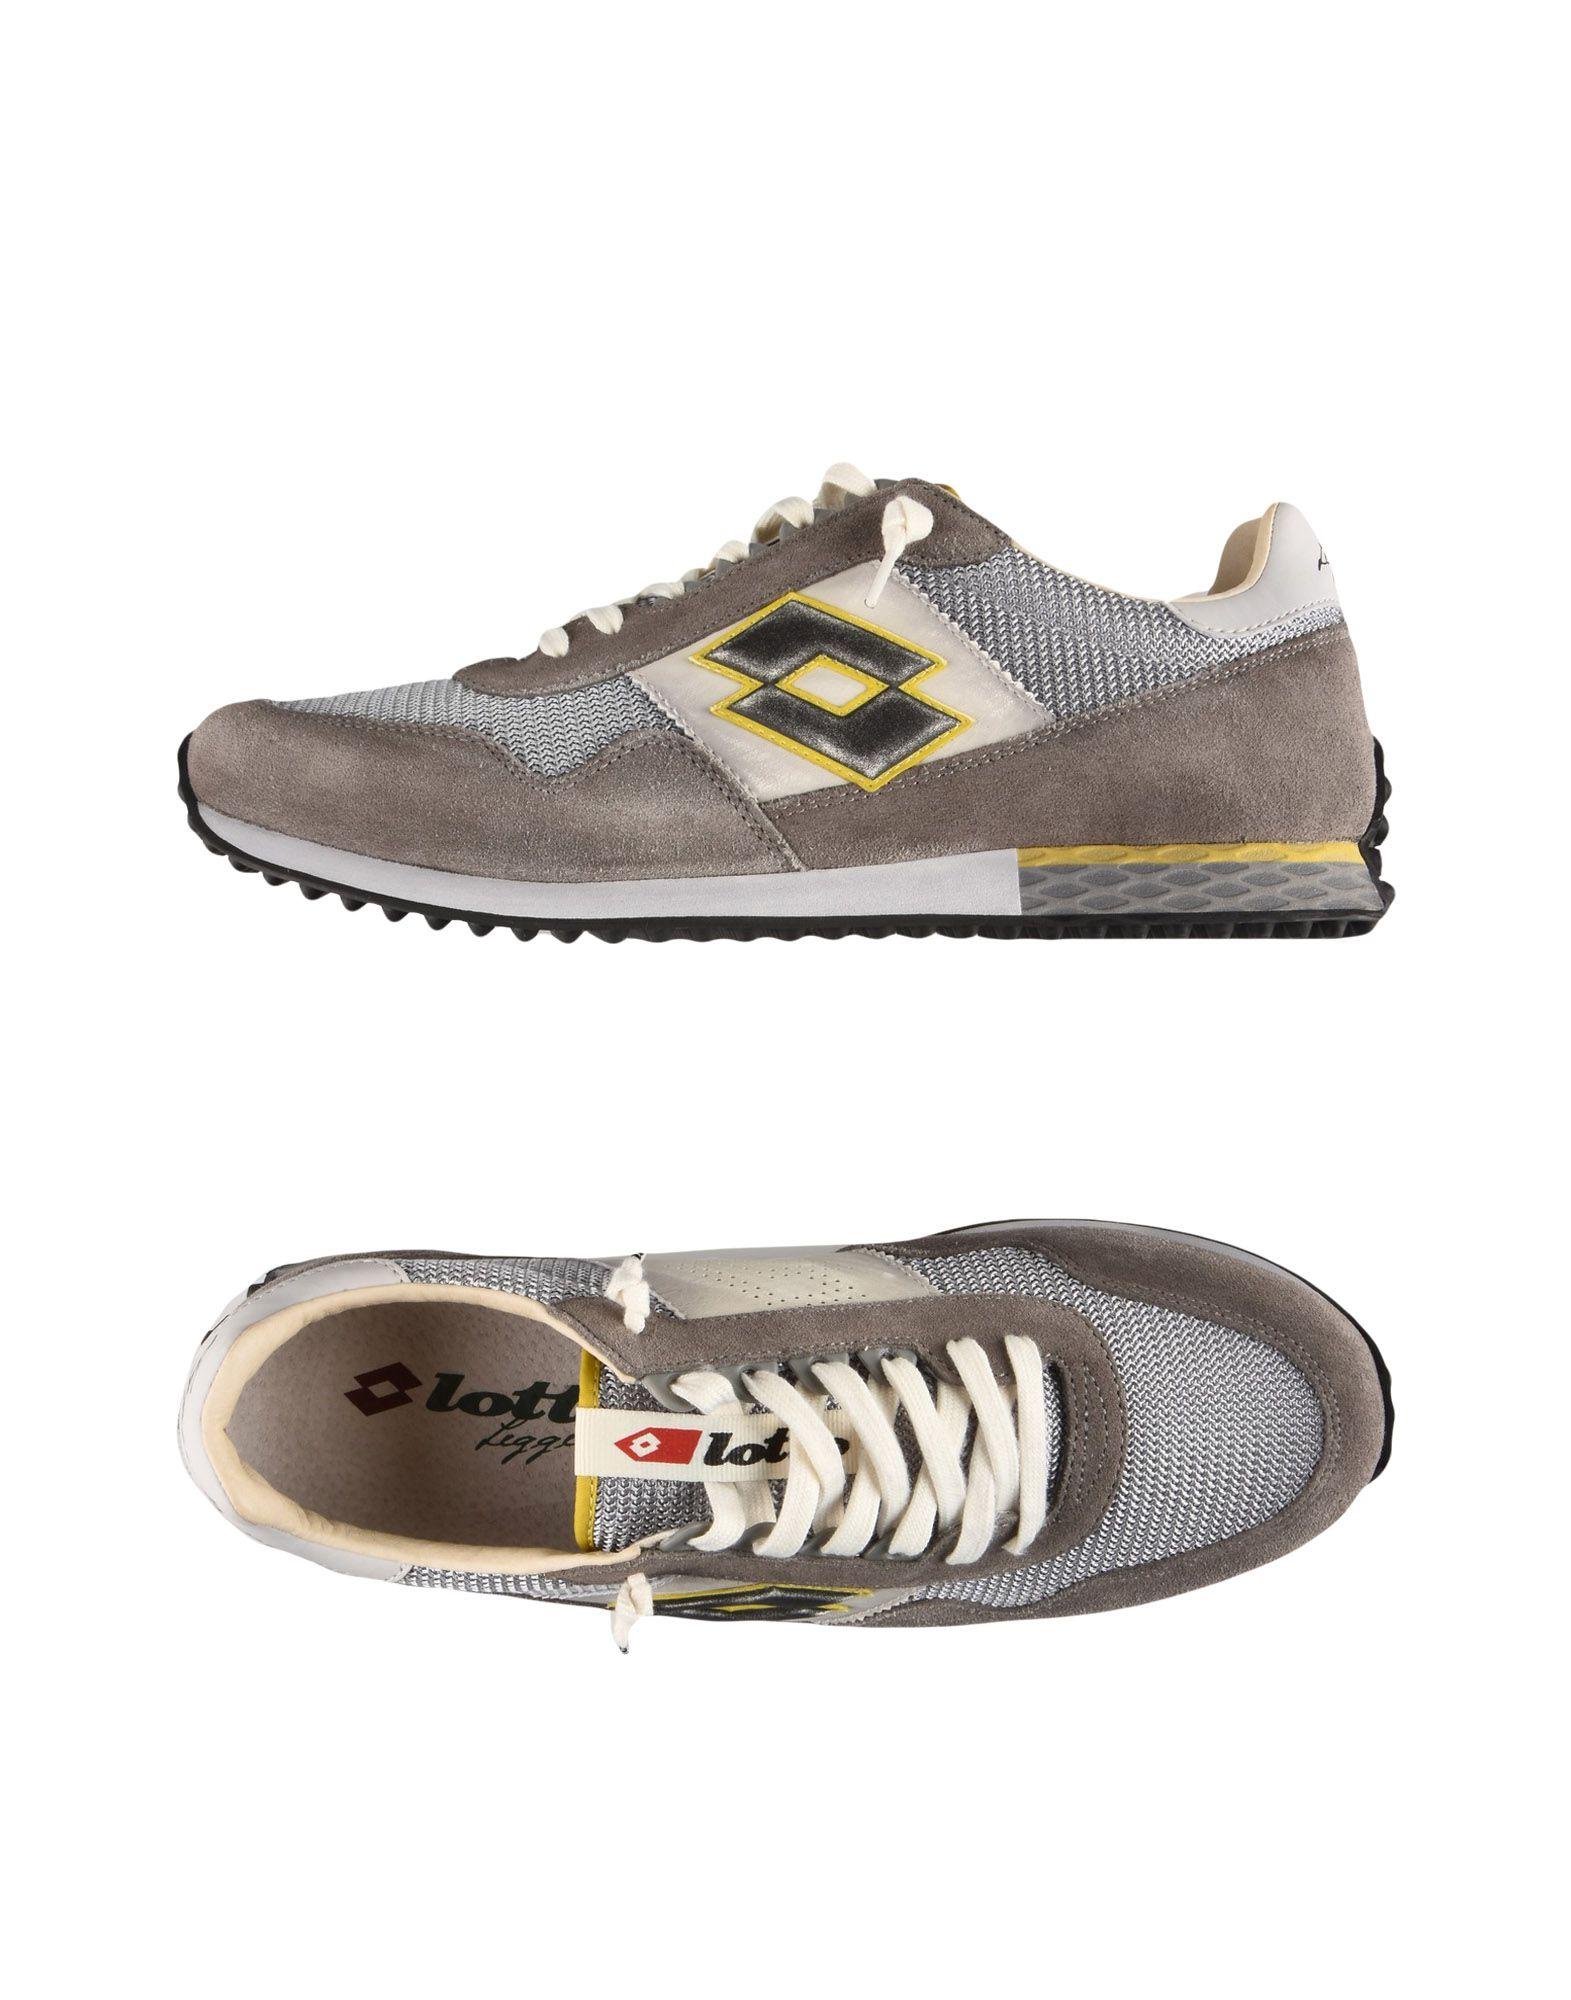 Lotto Leggenda  Tokyo Targa  11237649OT Gute Qualität beliebte Schuhe